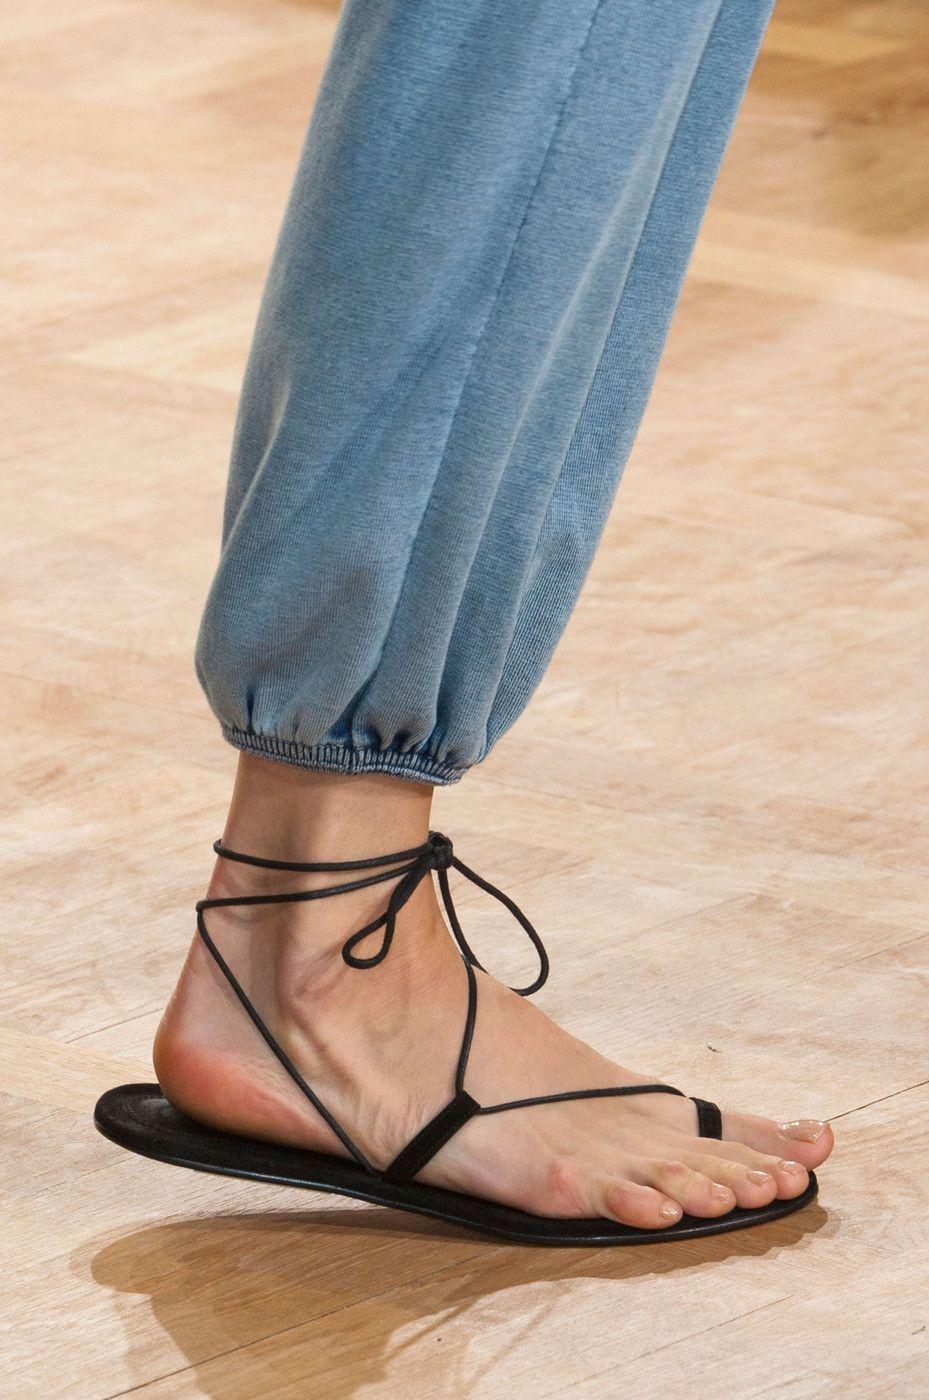 Chaussures plates en cuir GloveMartiniano zTgpGWUW